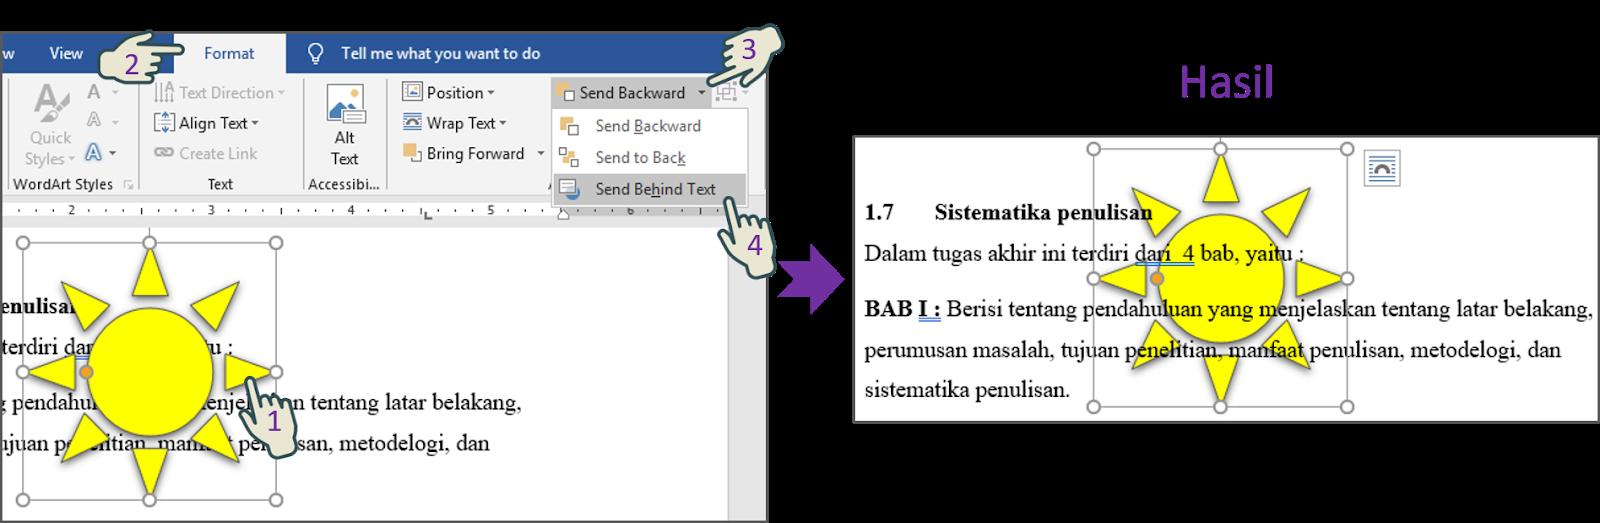 Send Behind Text